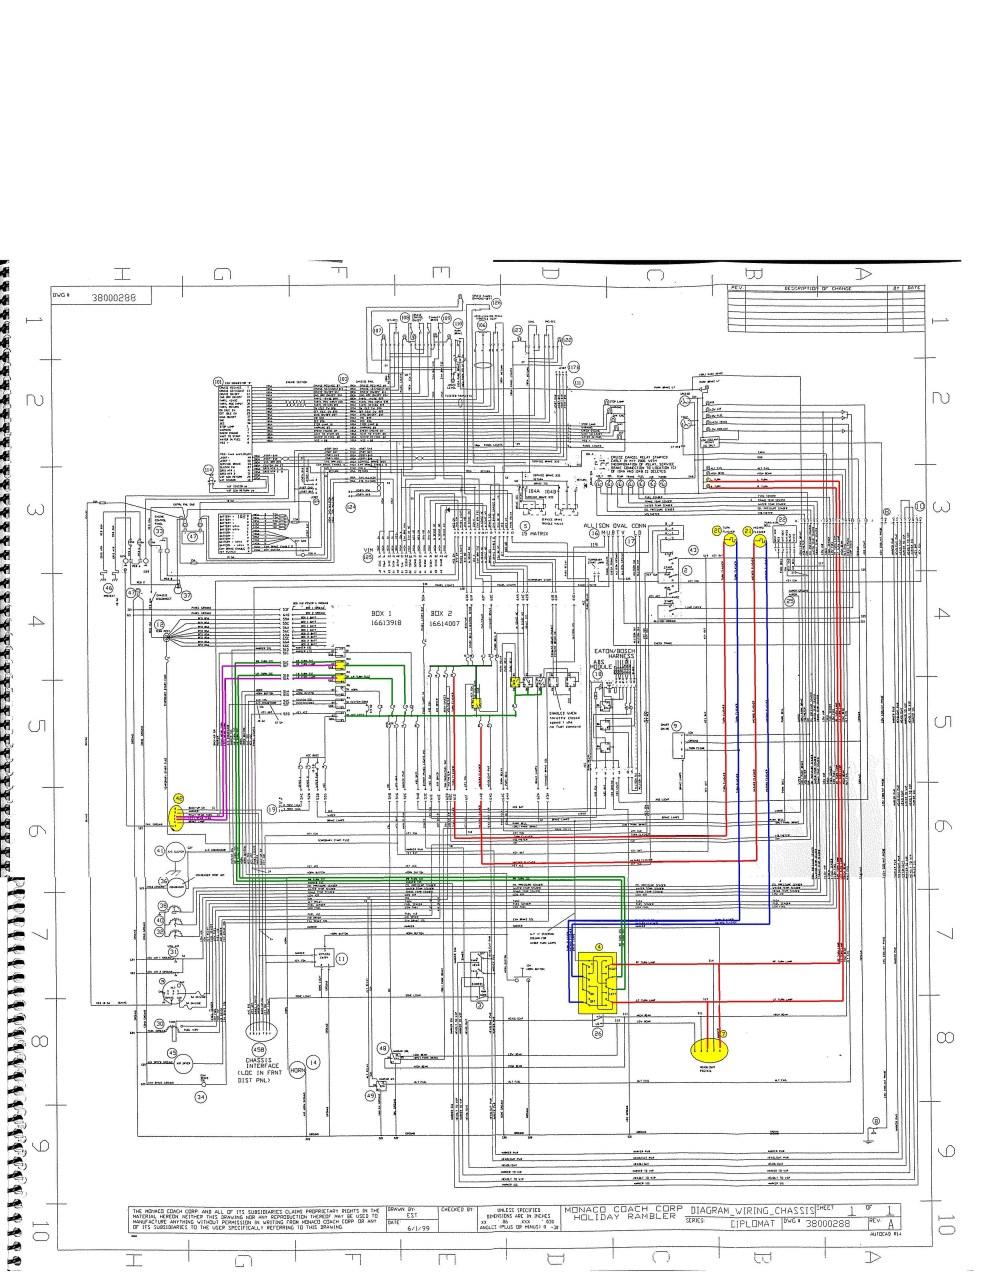 medium resolution of holiday rambler wiring diagrams wiring diagram expertsholiday rambler wiring diagram wiring diagram data 2006 holiday rambler